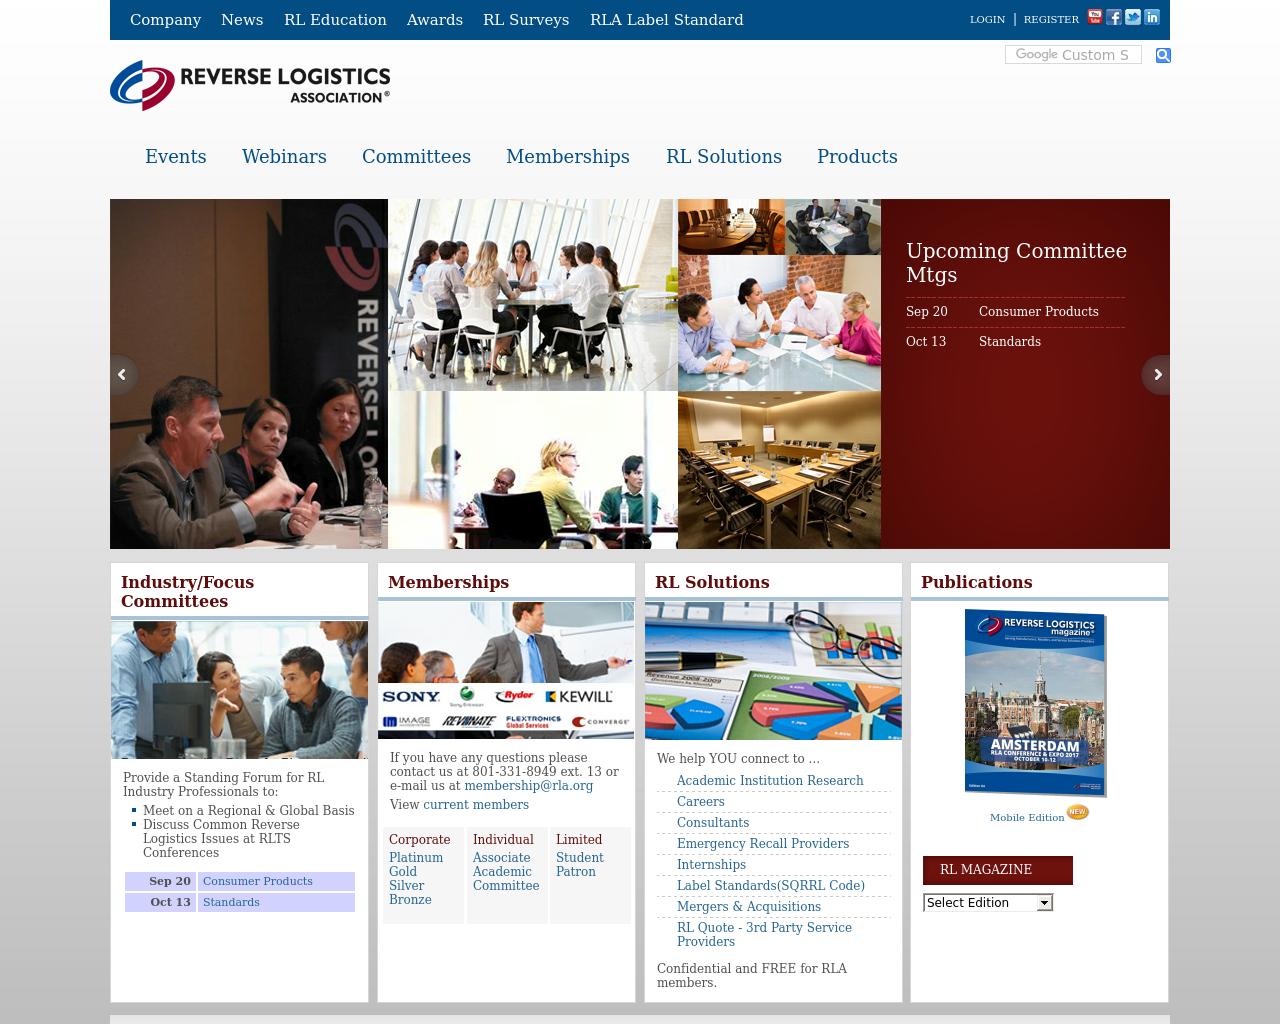 Riverse-Logistics-Association-Advertising-Reviews-Pricing